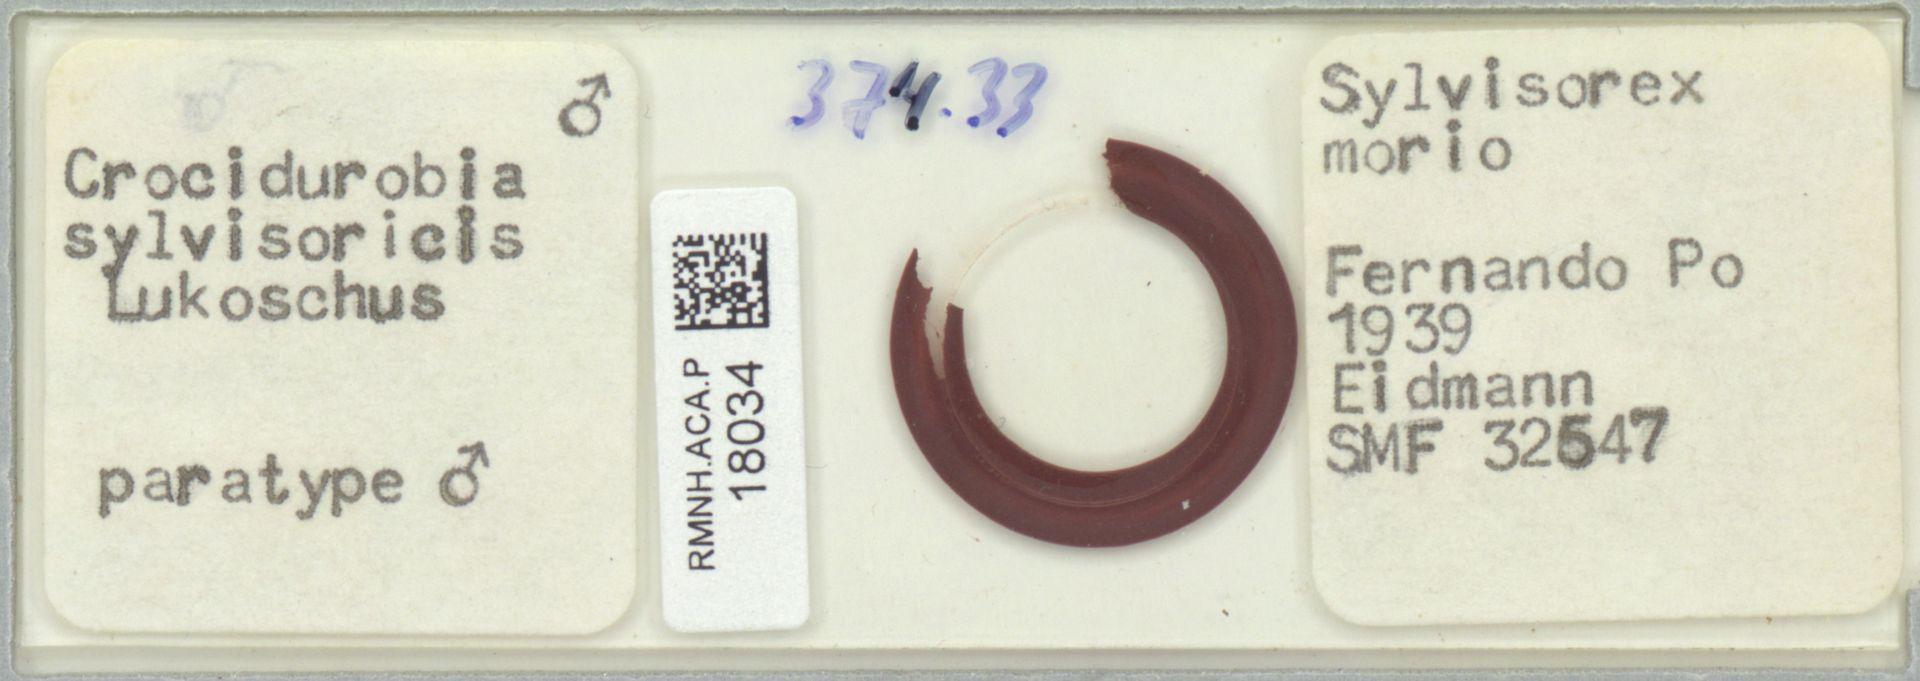 RMNH.ACA.P.18034 | Crocidurobia sylvisoricis